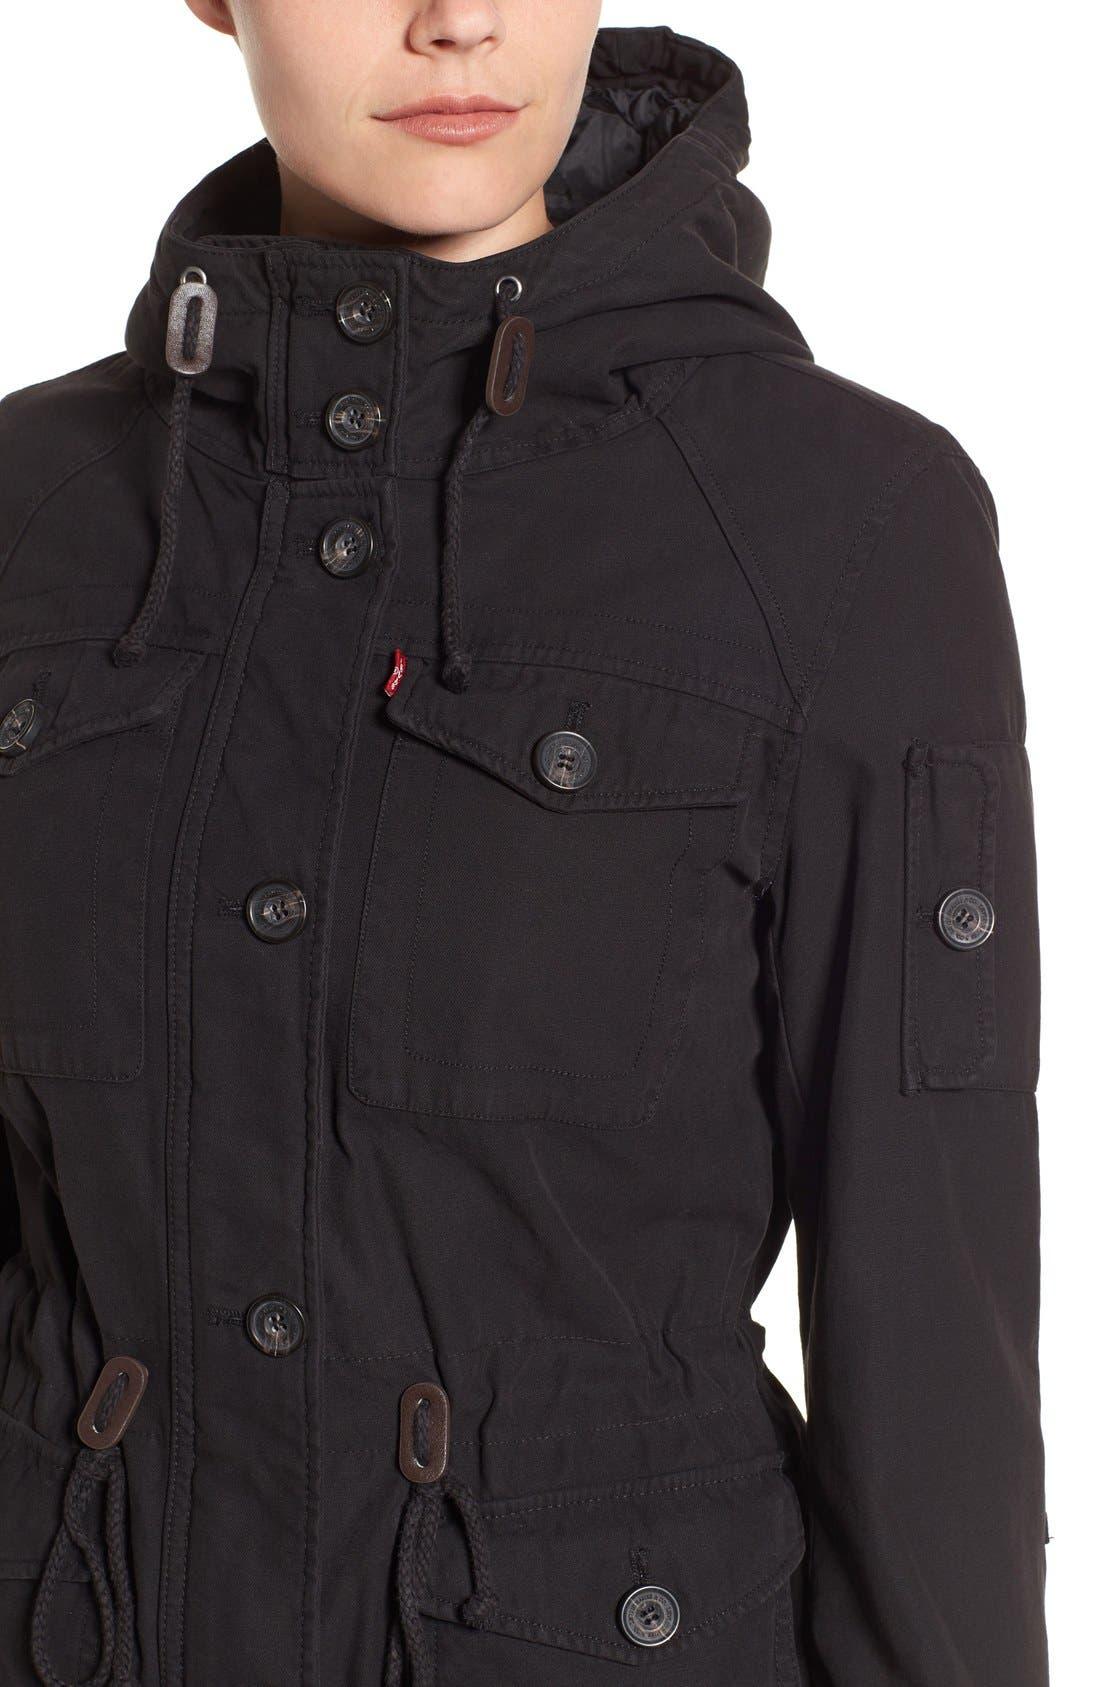 Cotton Twill Utility Jacket,                             Alternate thumbnail 4, color,                             001